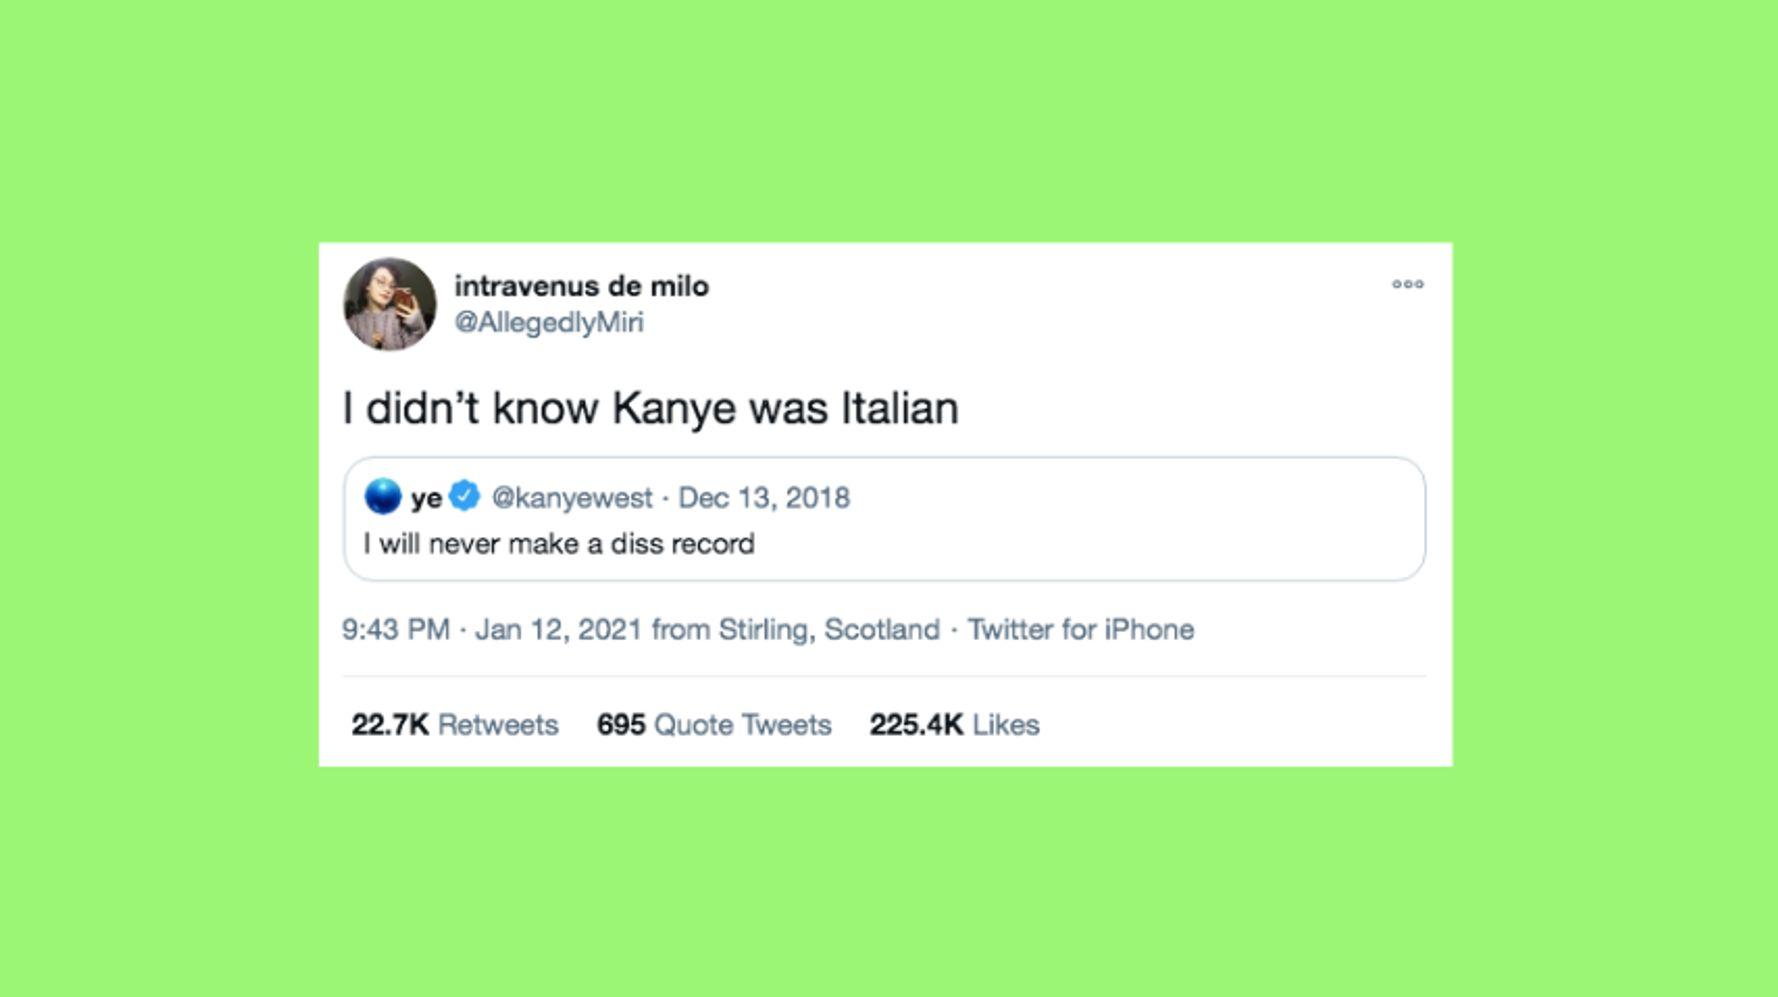 The 20 Funniest Tweets From Women This Week (Jan. 9-15)